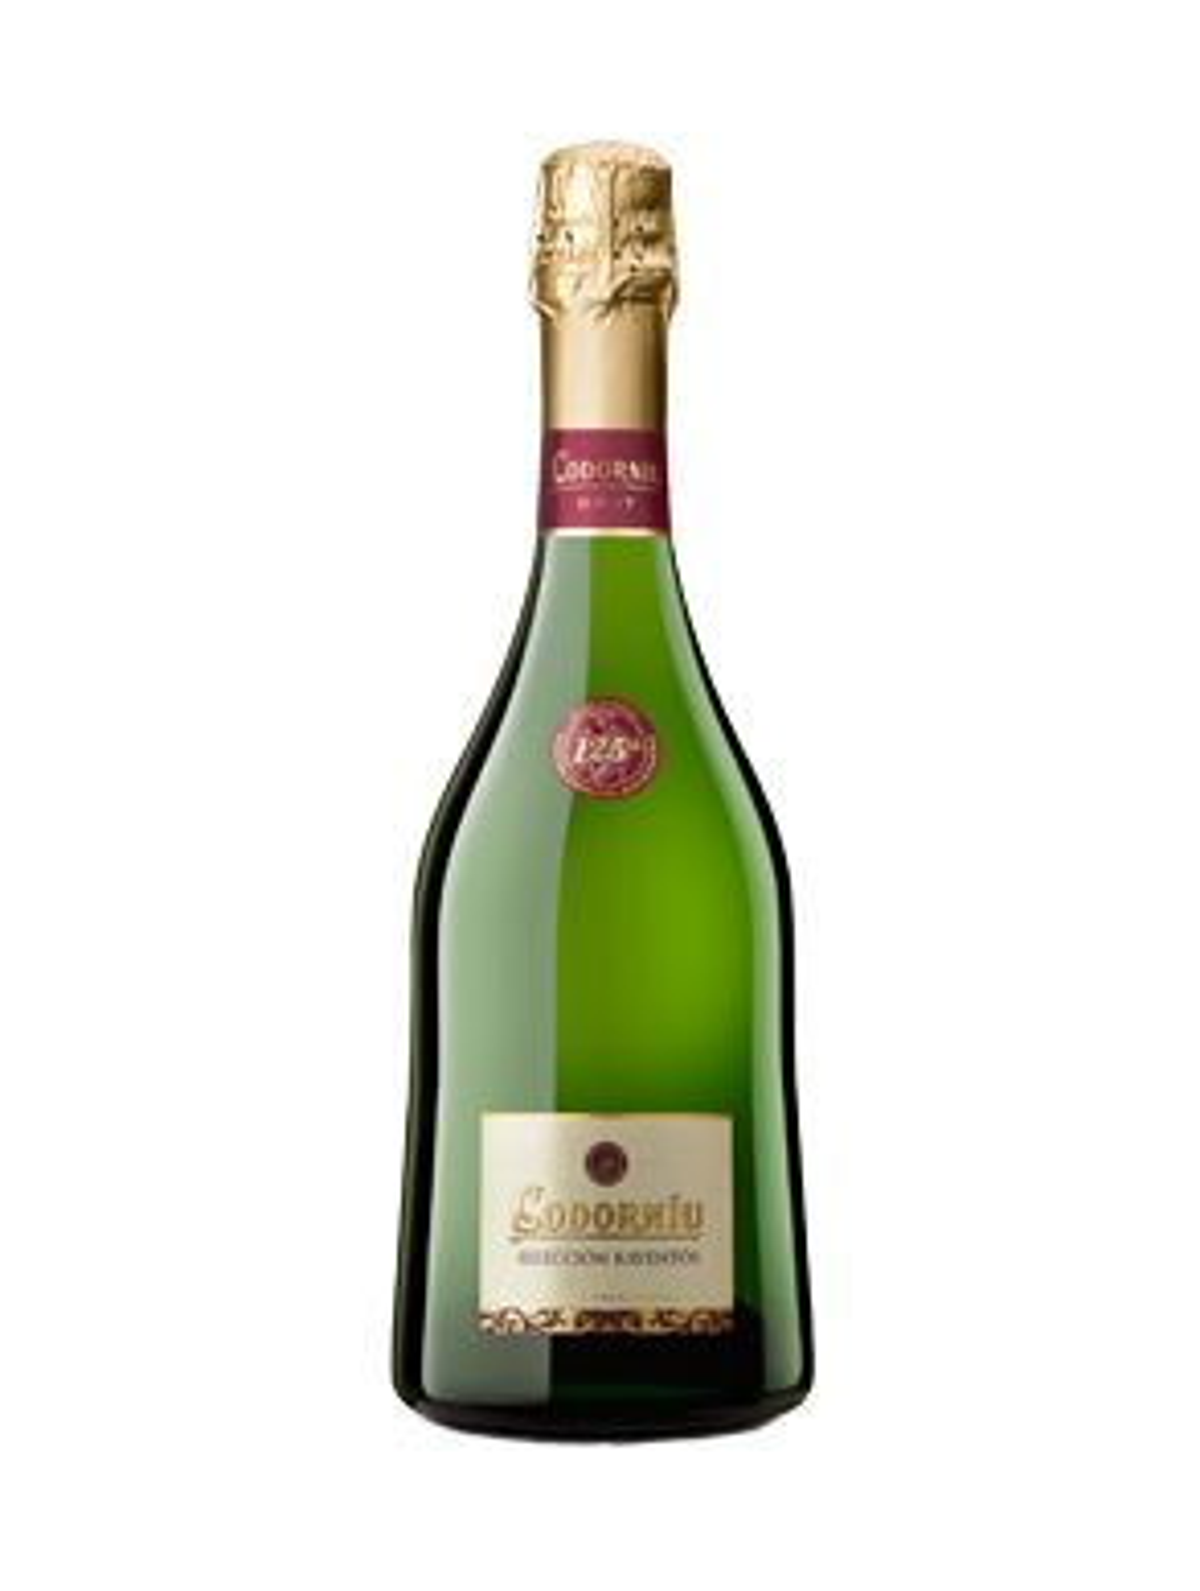 Codorniu Seleccion Raventos Brut Cava Sparkling Wine Spain NV 70cl